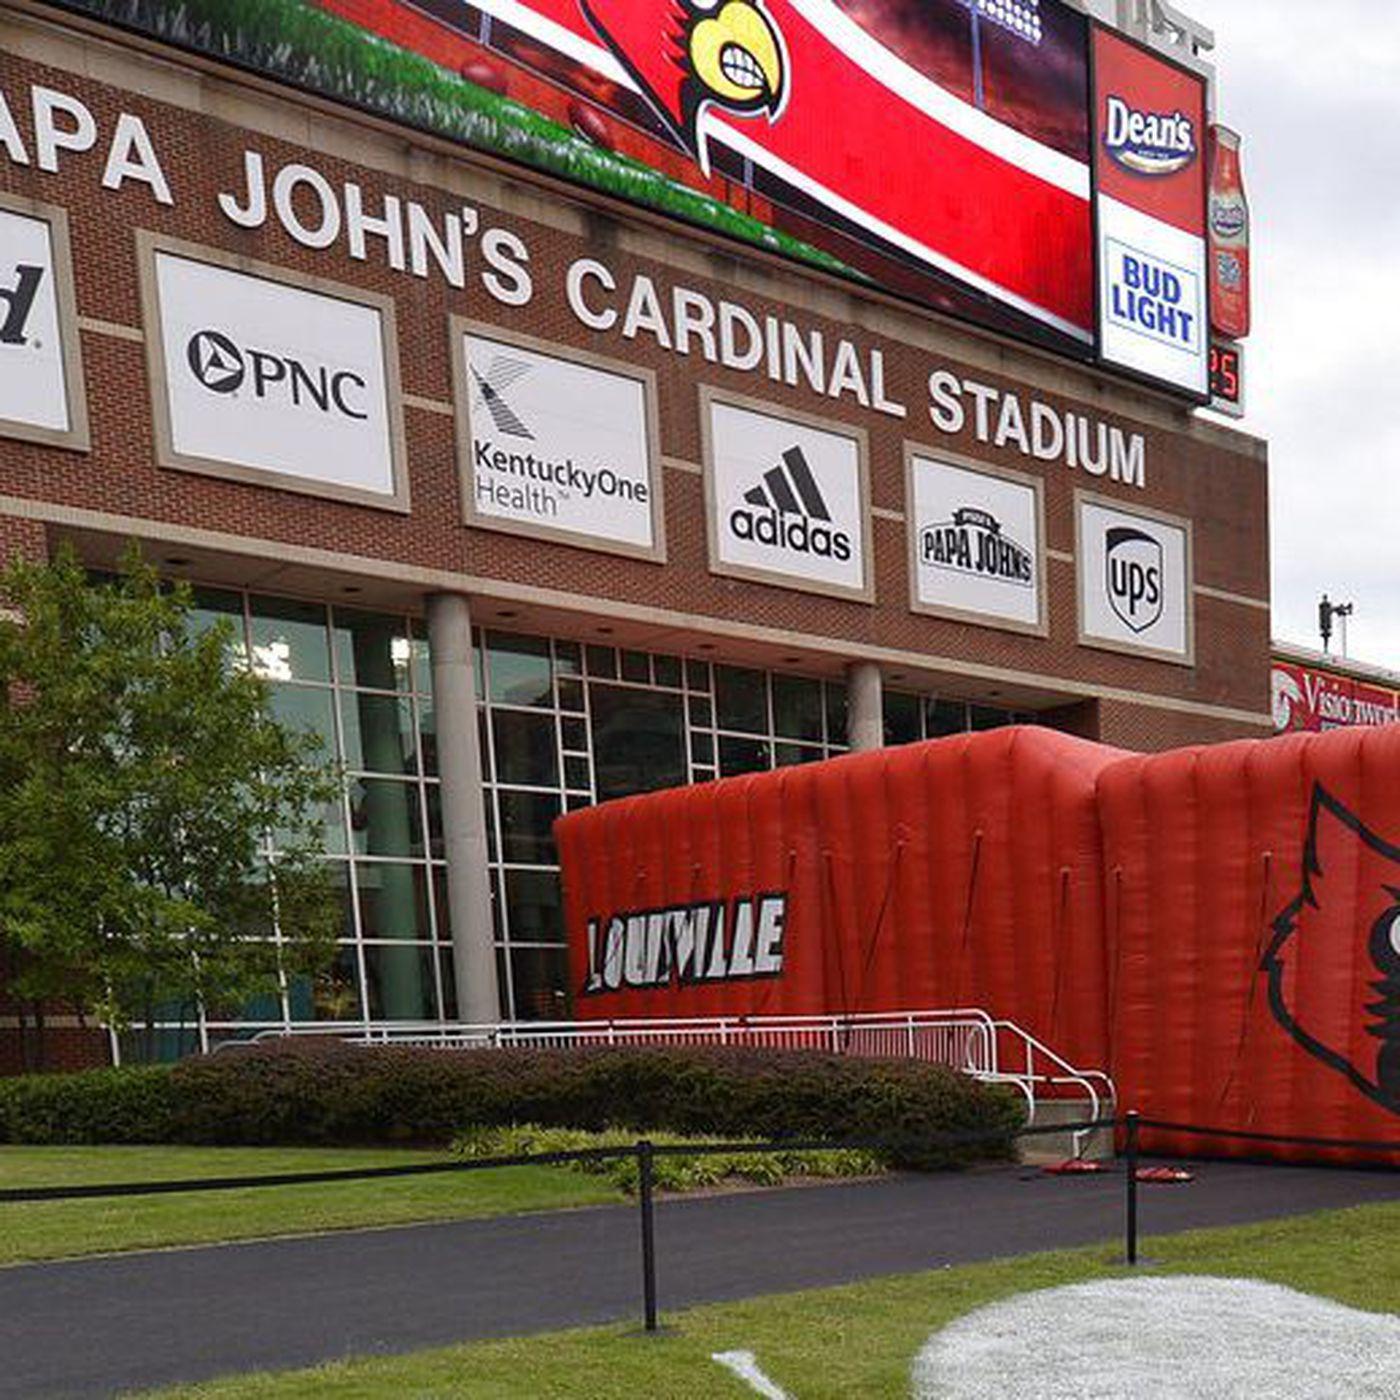 c869b43b8f3 Papa John s name removed from the University of Louisville stadium ...